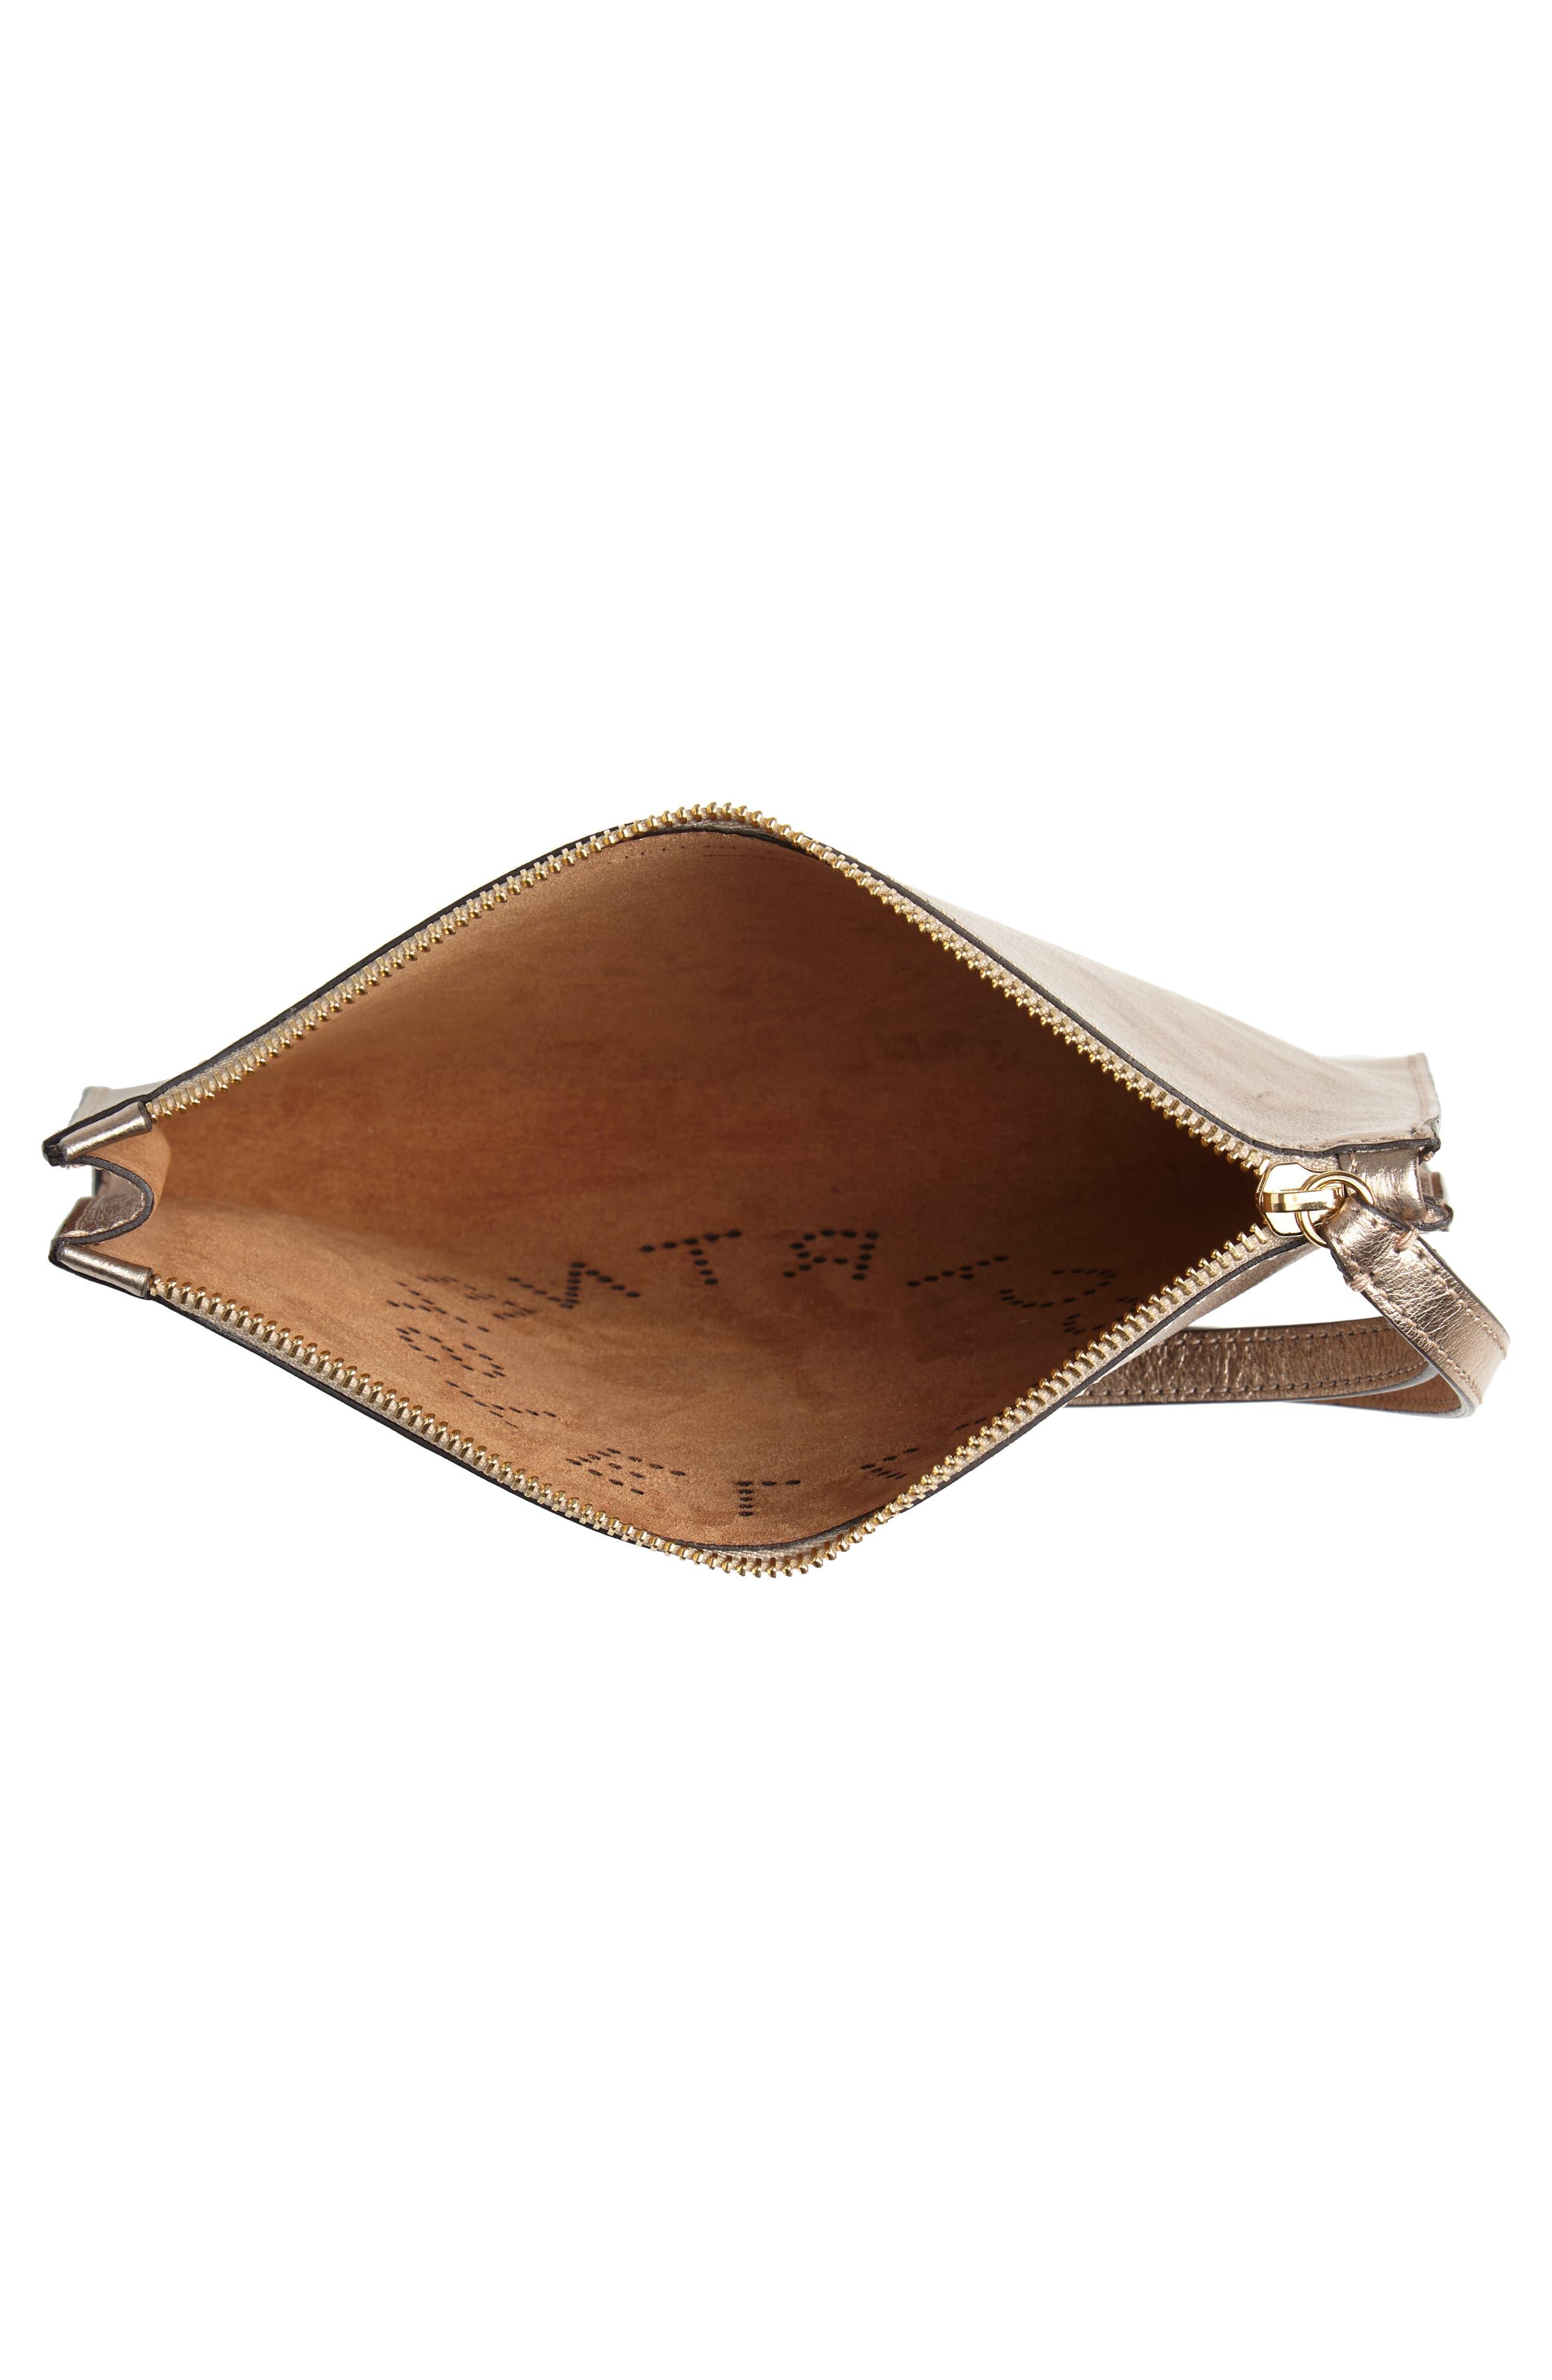 Metallic Faux Nappa Leather Wristlet Clutch,                             Alternate thumbnail 4, color,                             ROSE GOLD